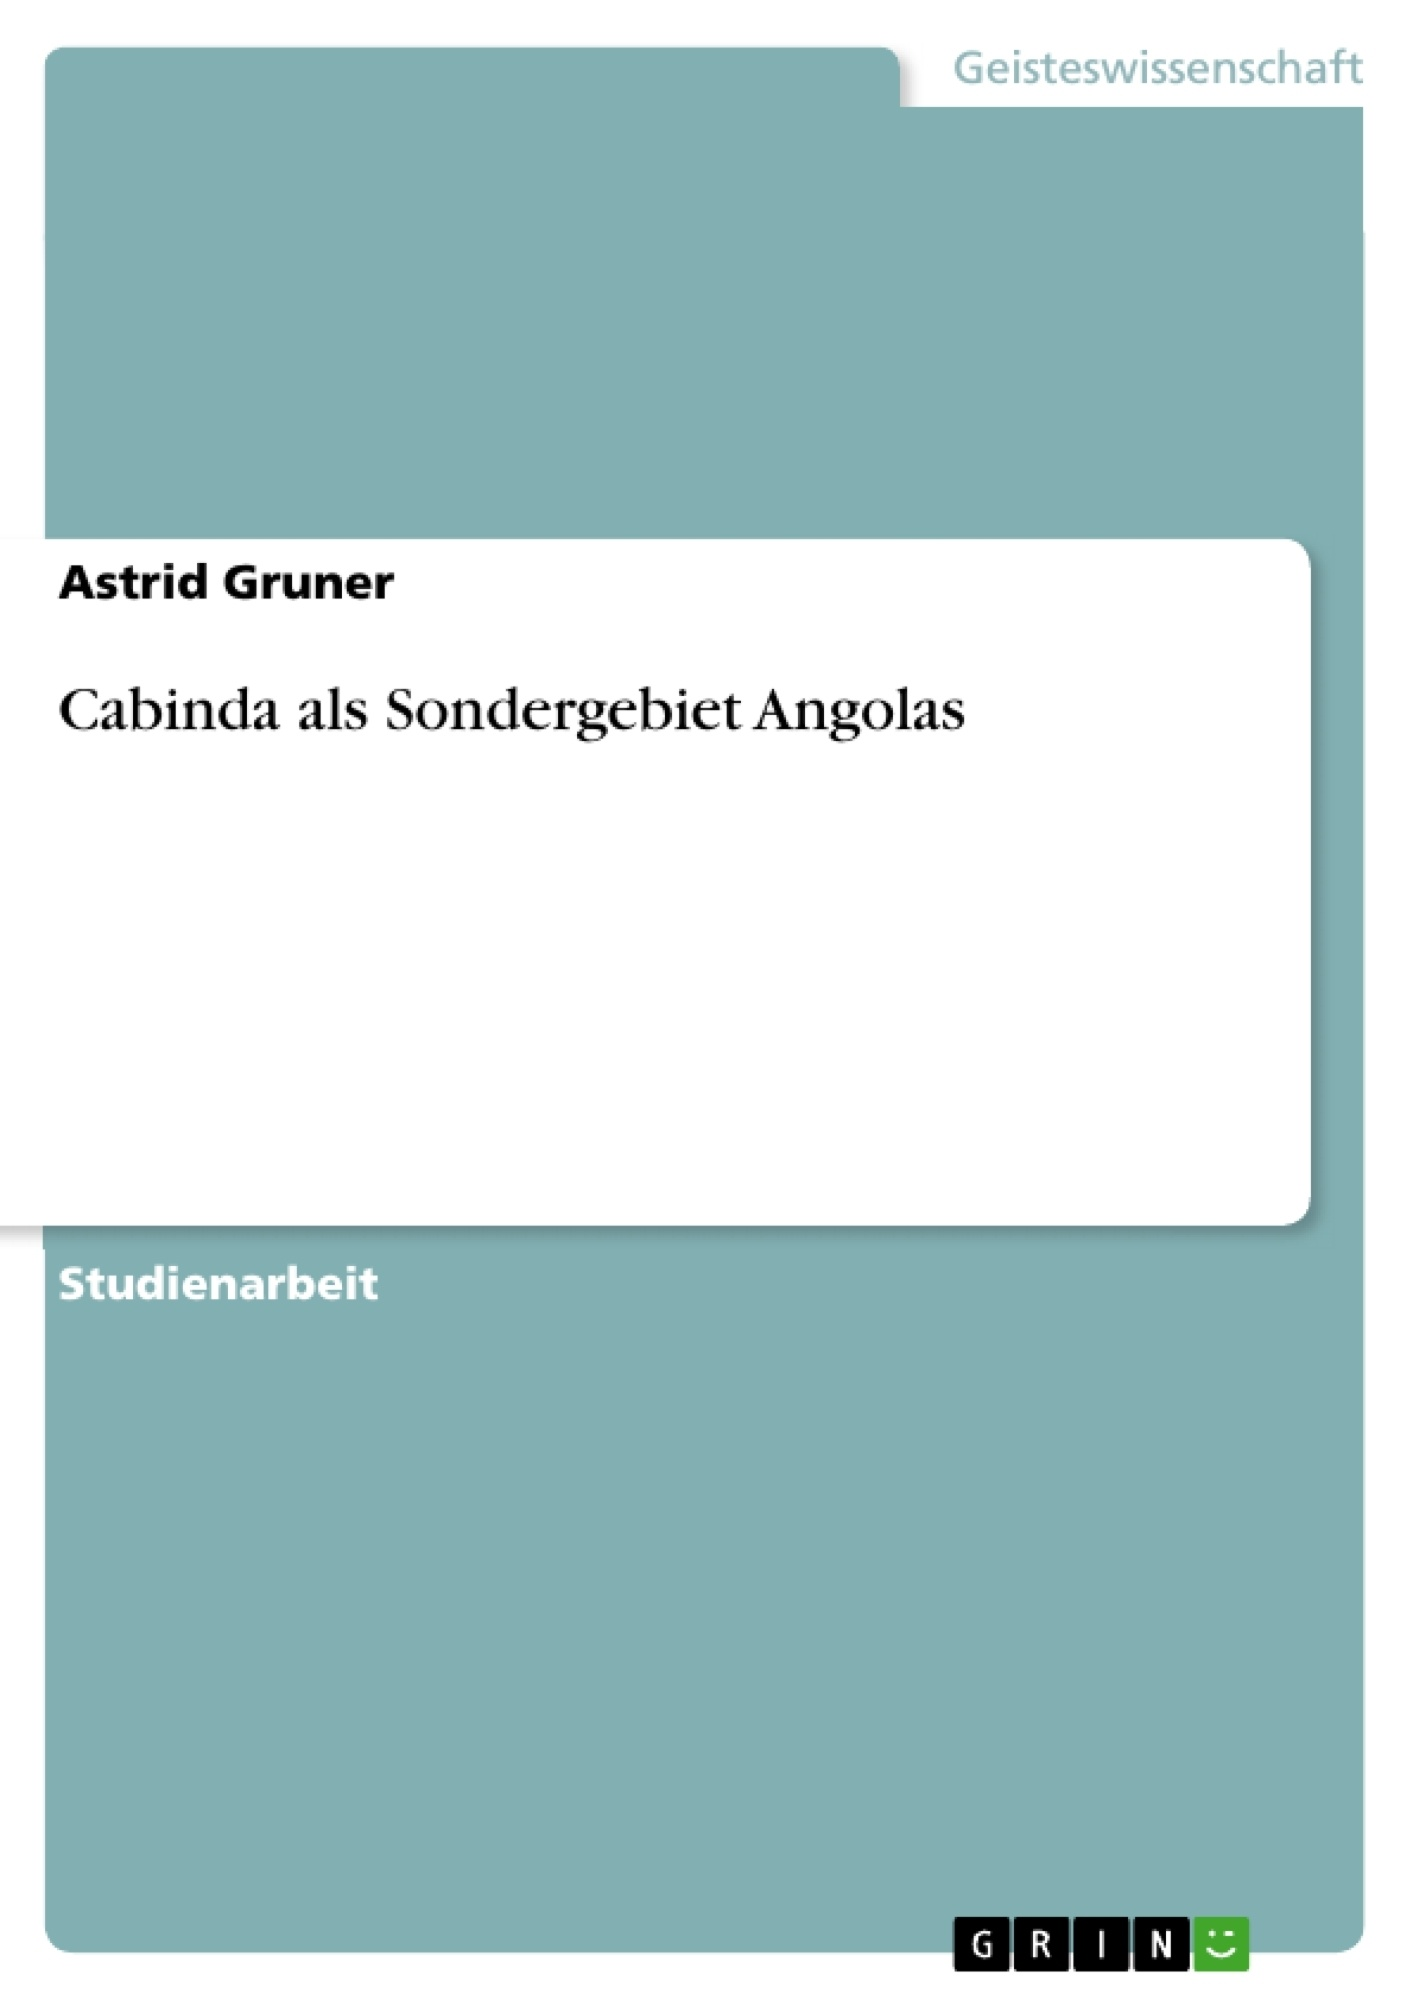 Titel: Cabinda als Sondergebiet Angolas